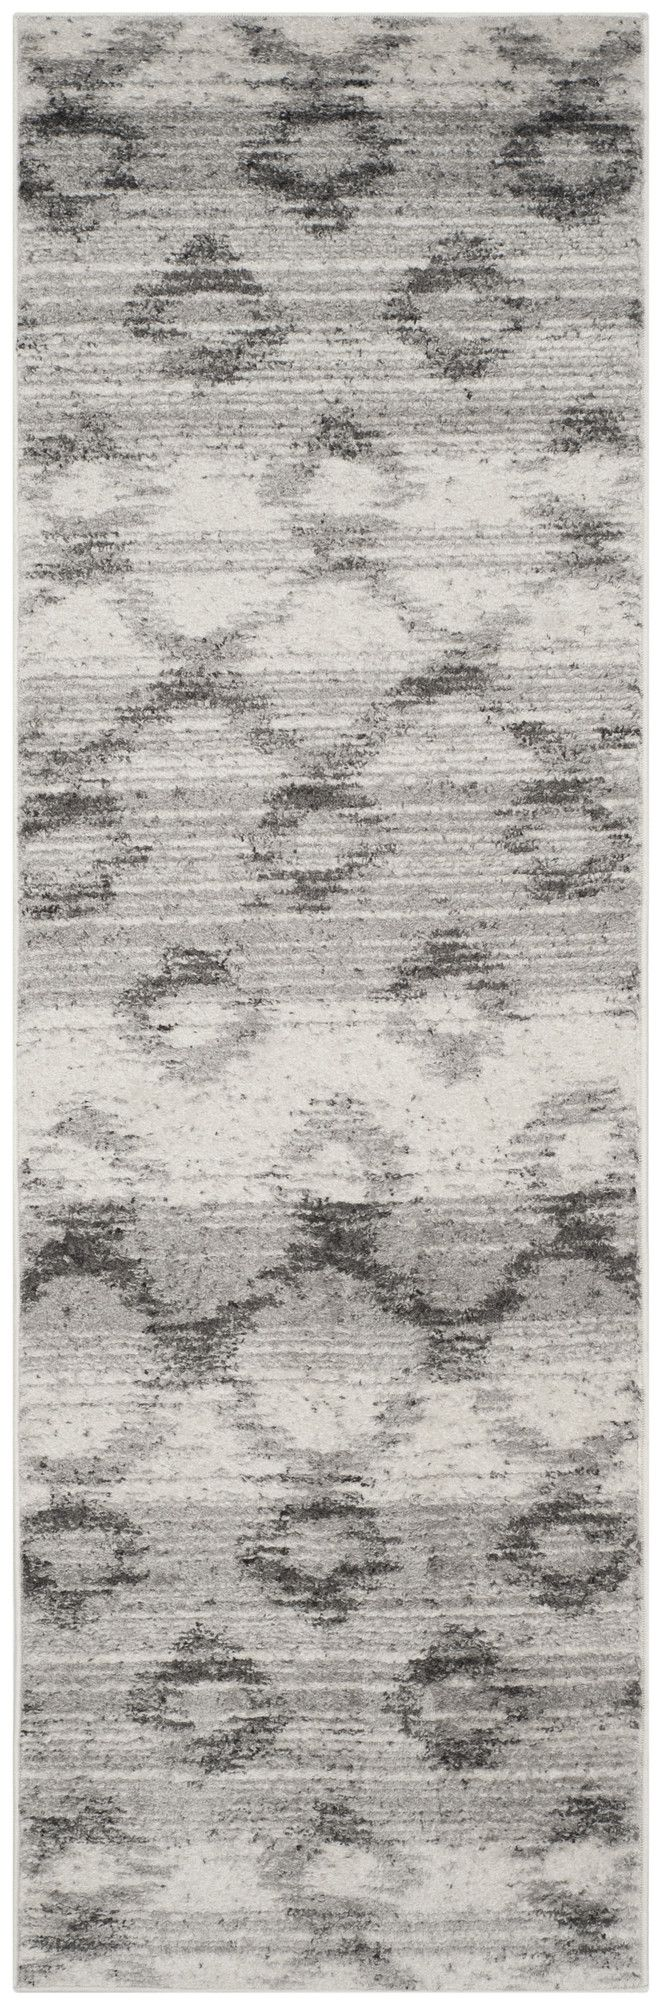 Costa Mesa Silver/Charcoal Area Rug